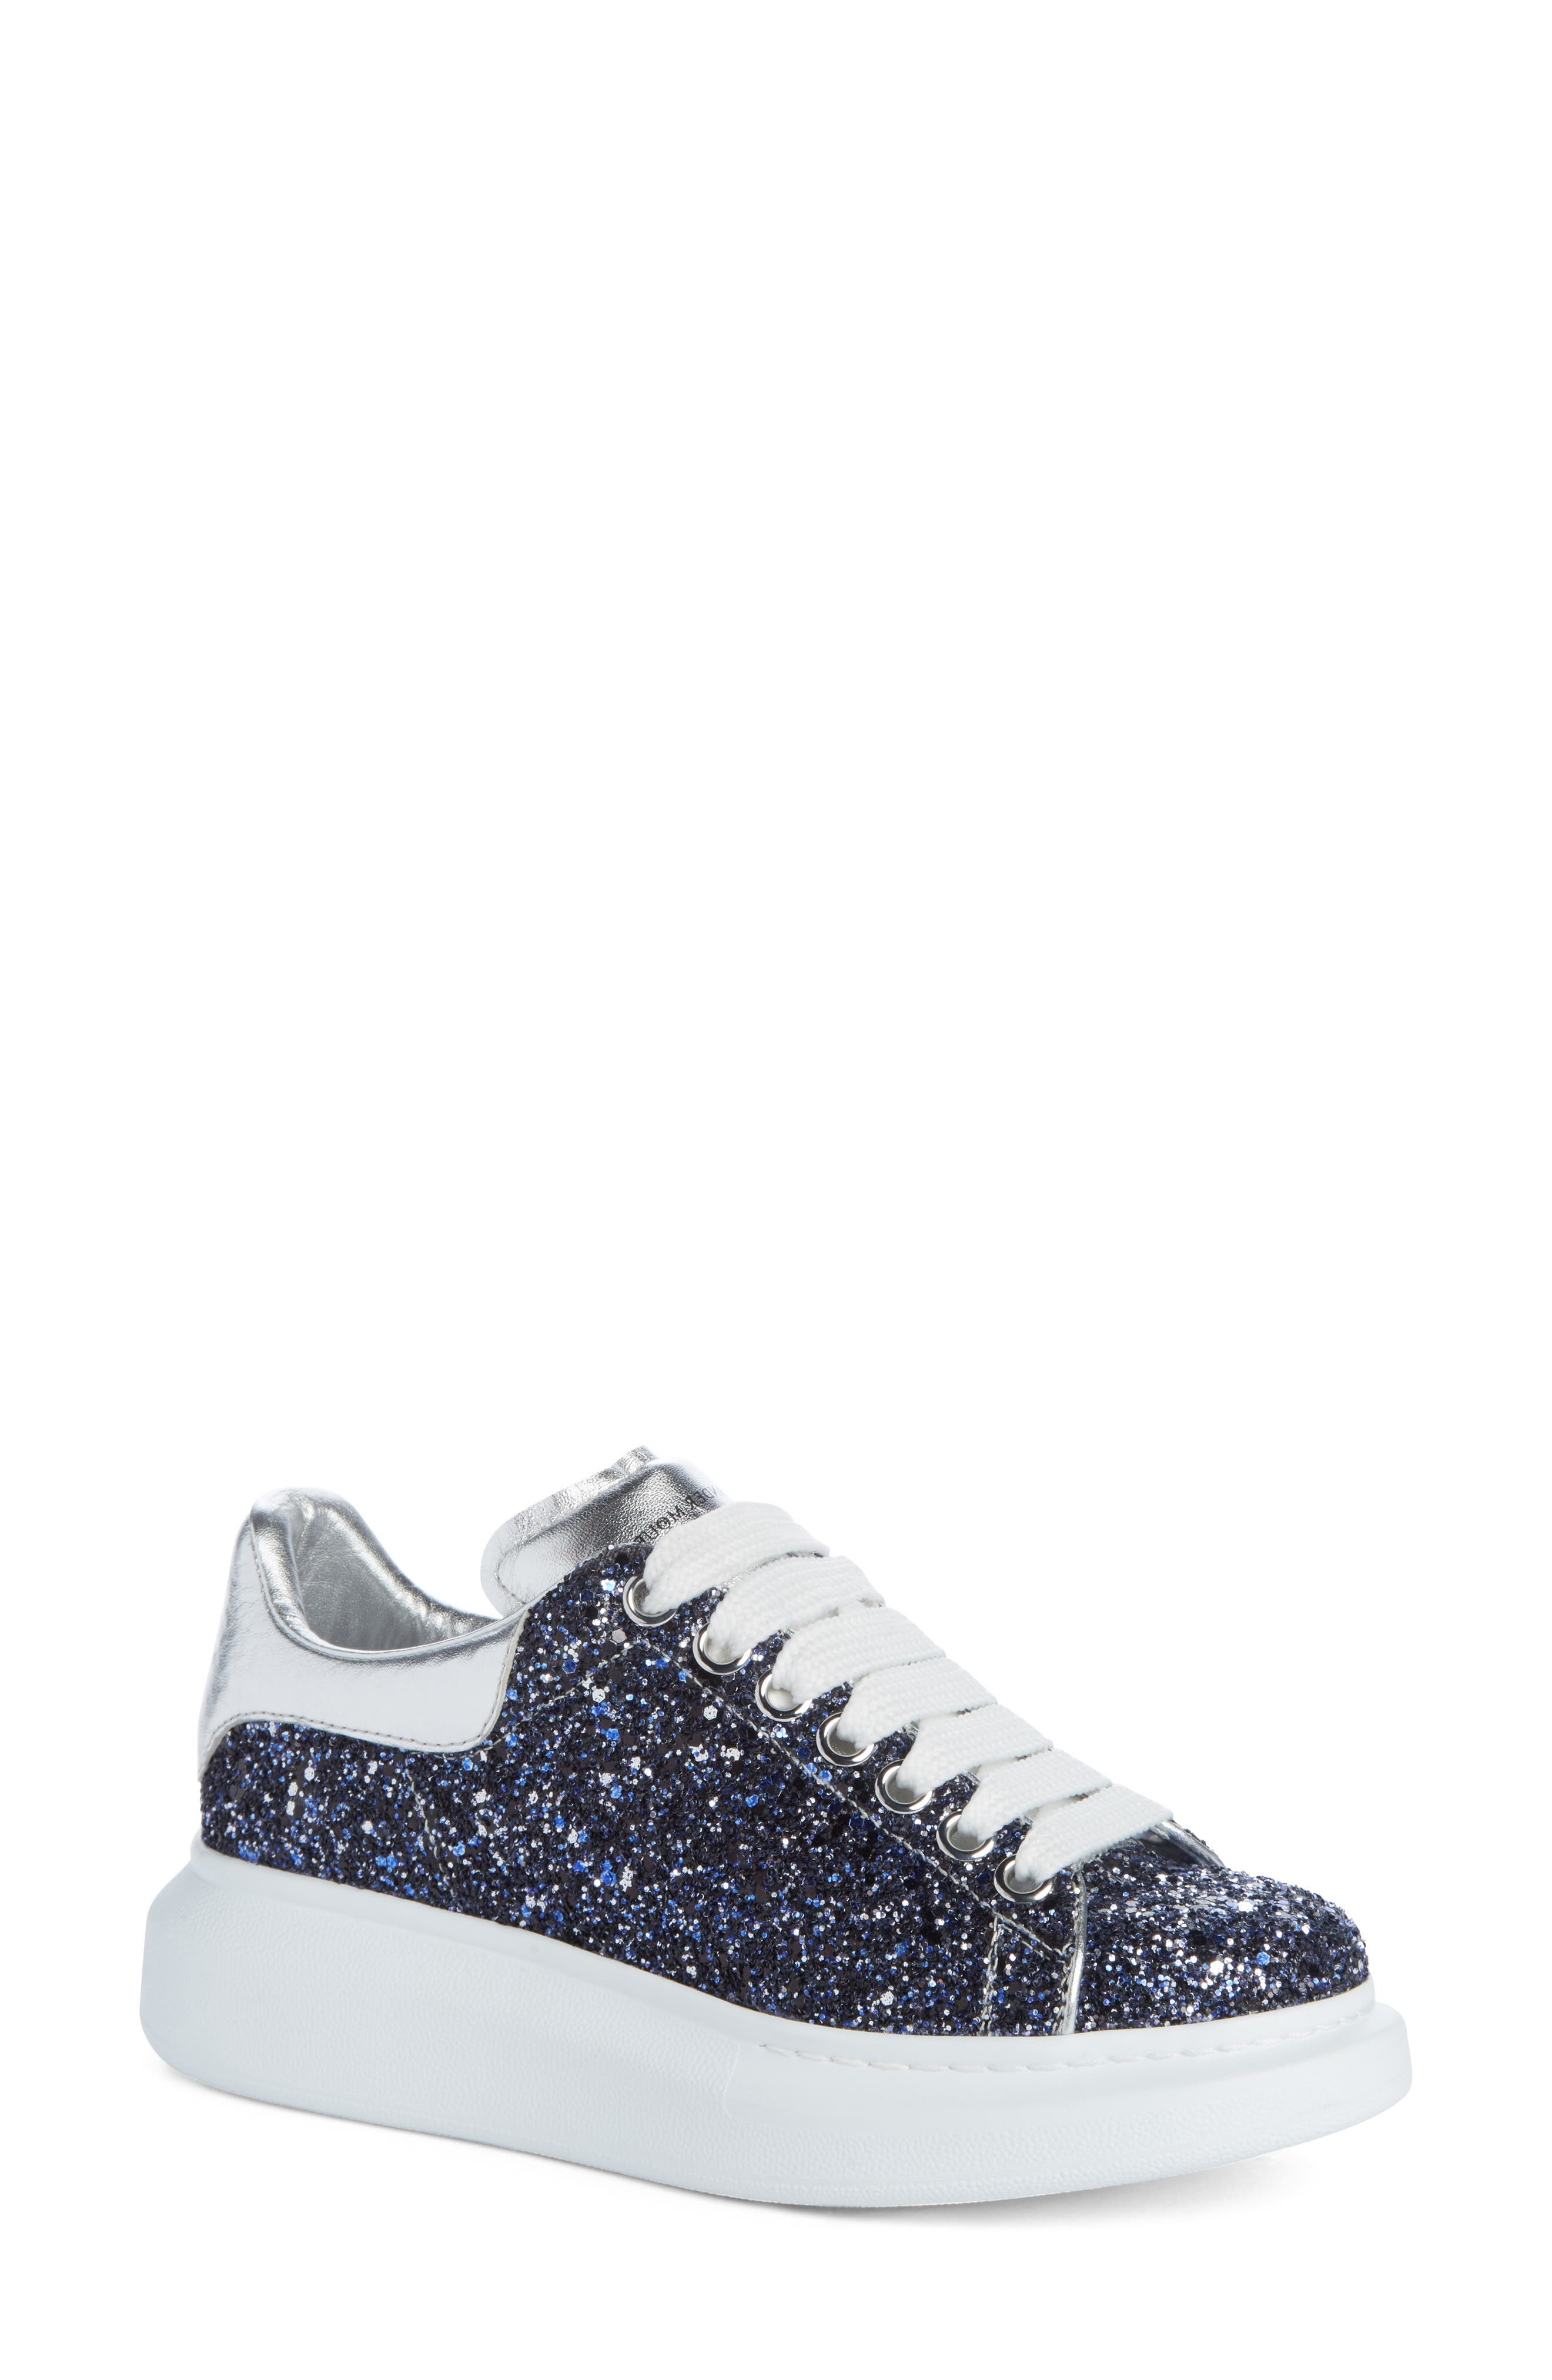 Cool Sneakers Unisex Bright U82302172